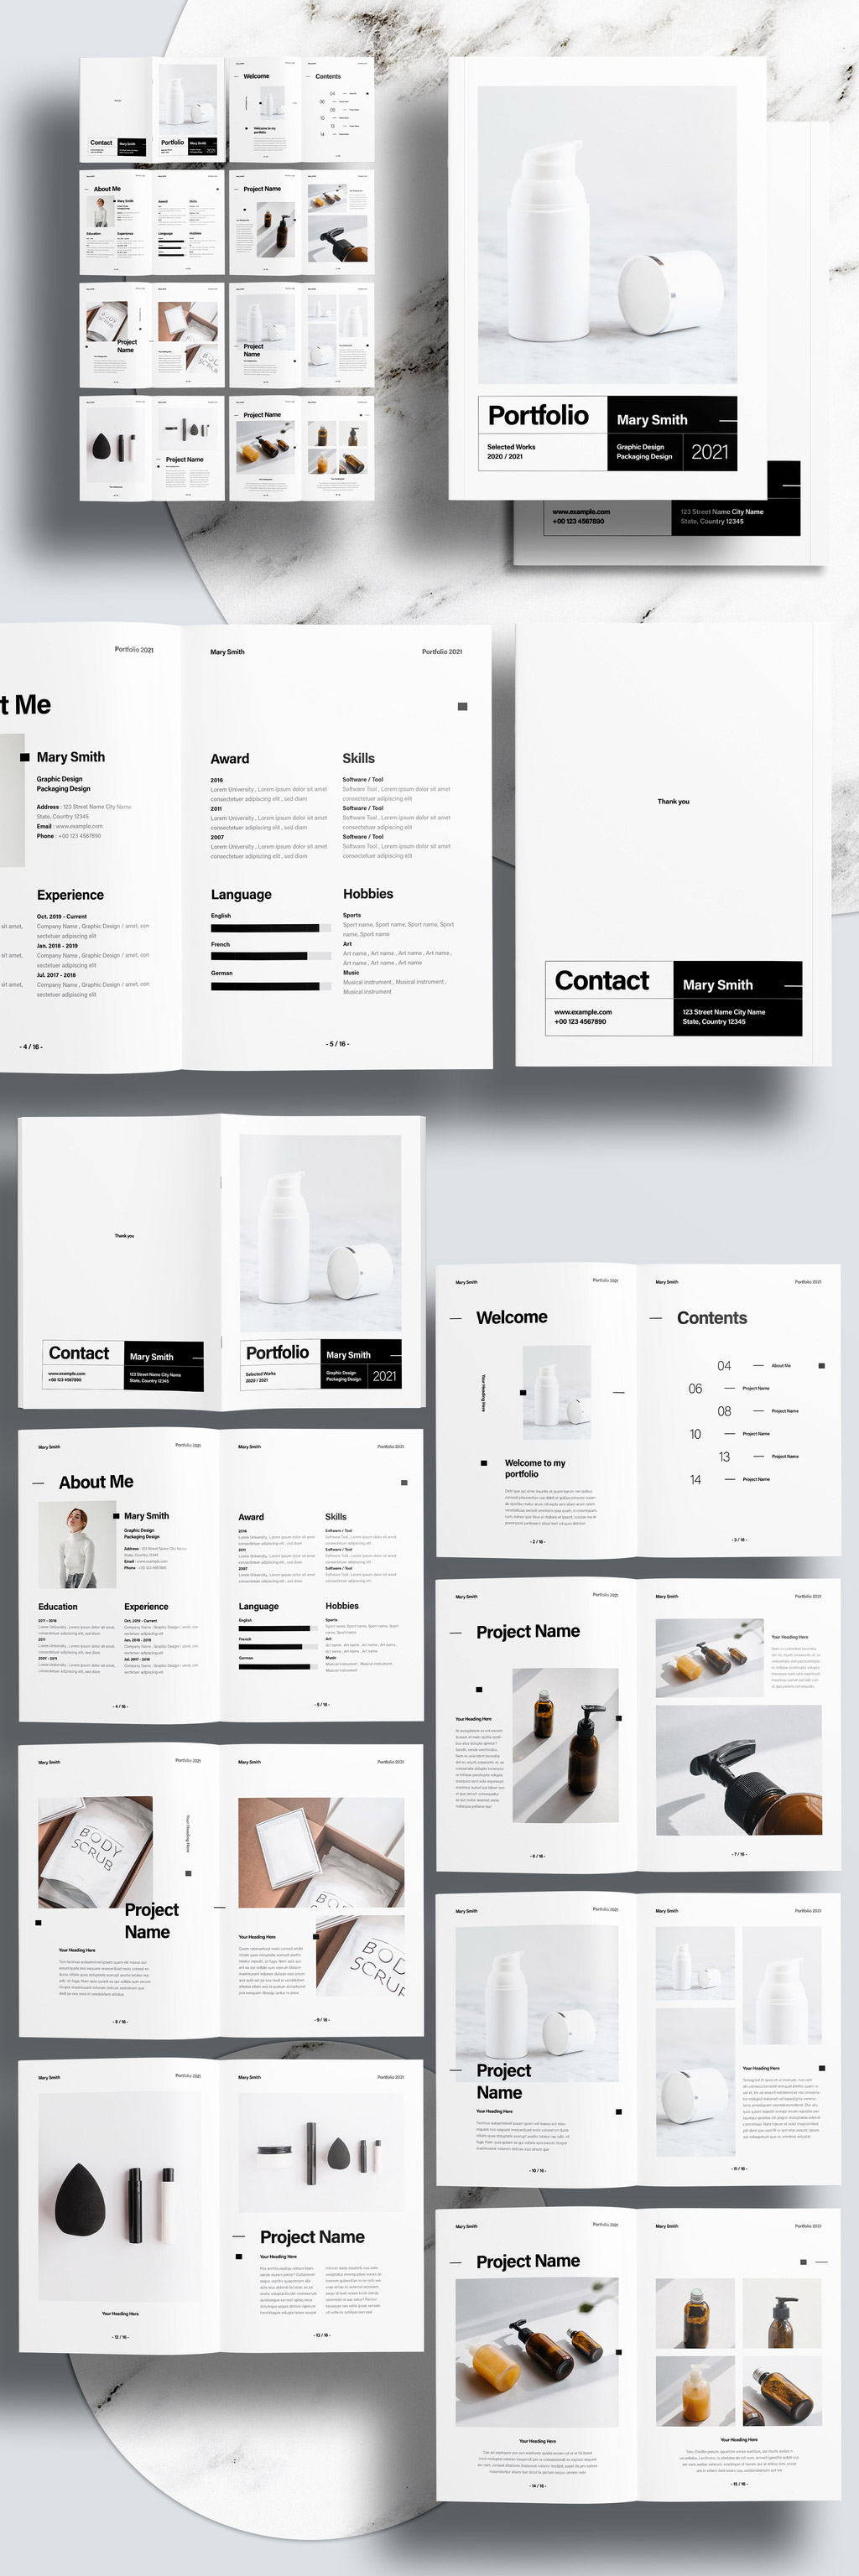 Modern Portfolio Template for Adobe InDesign